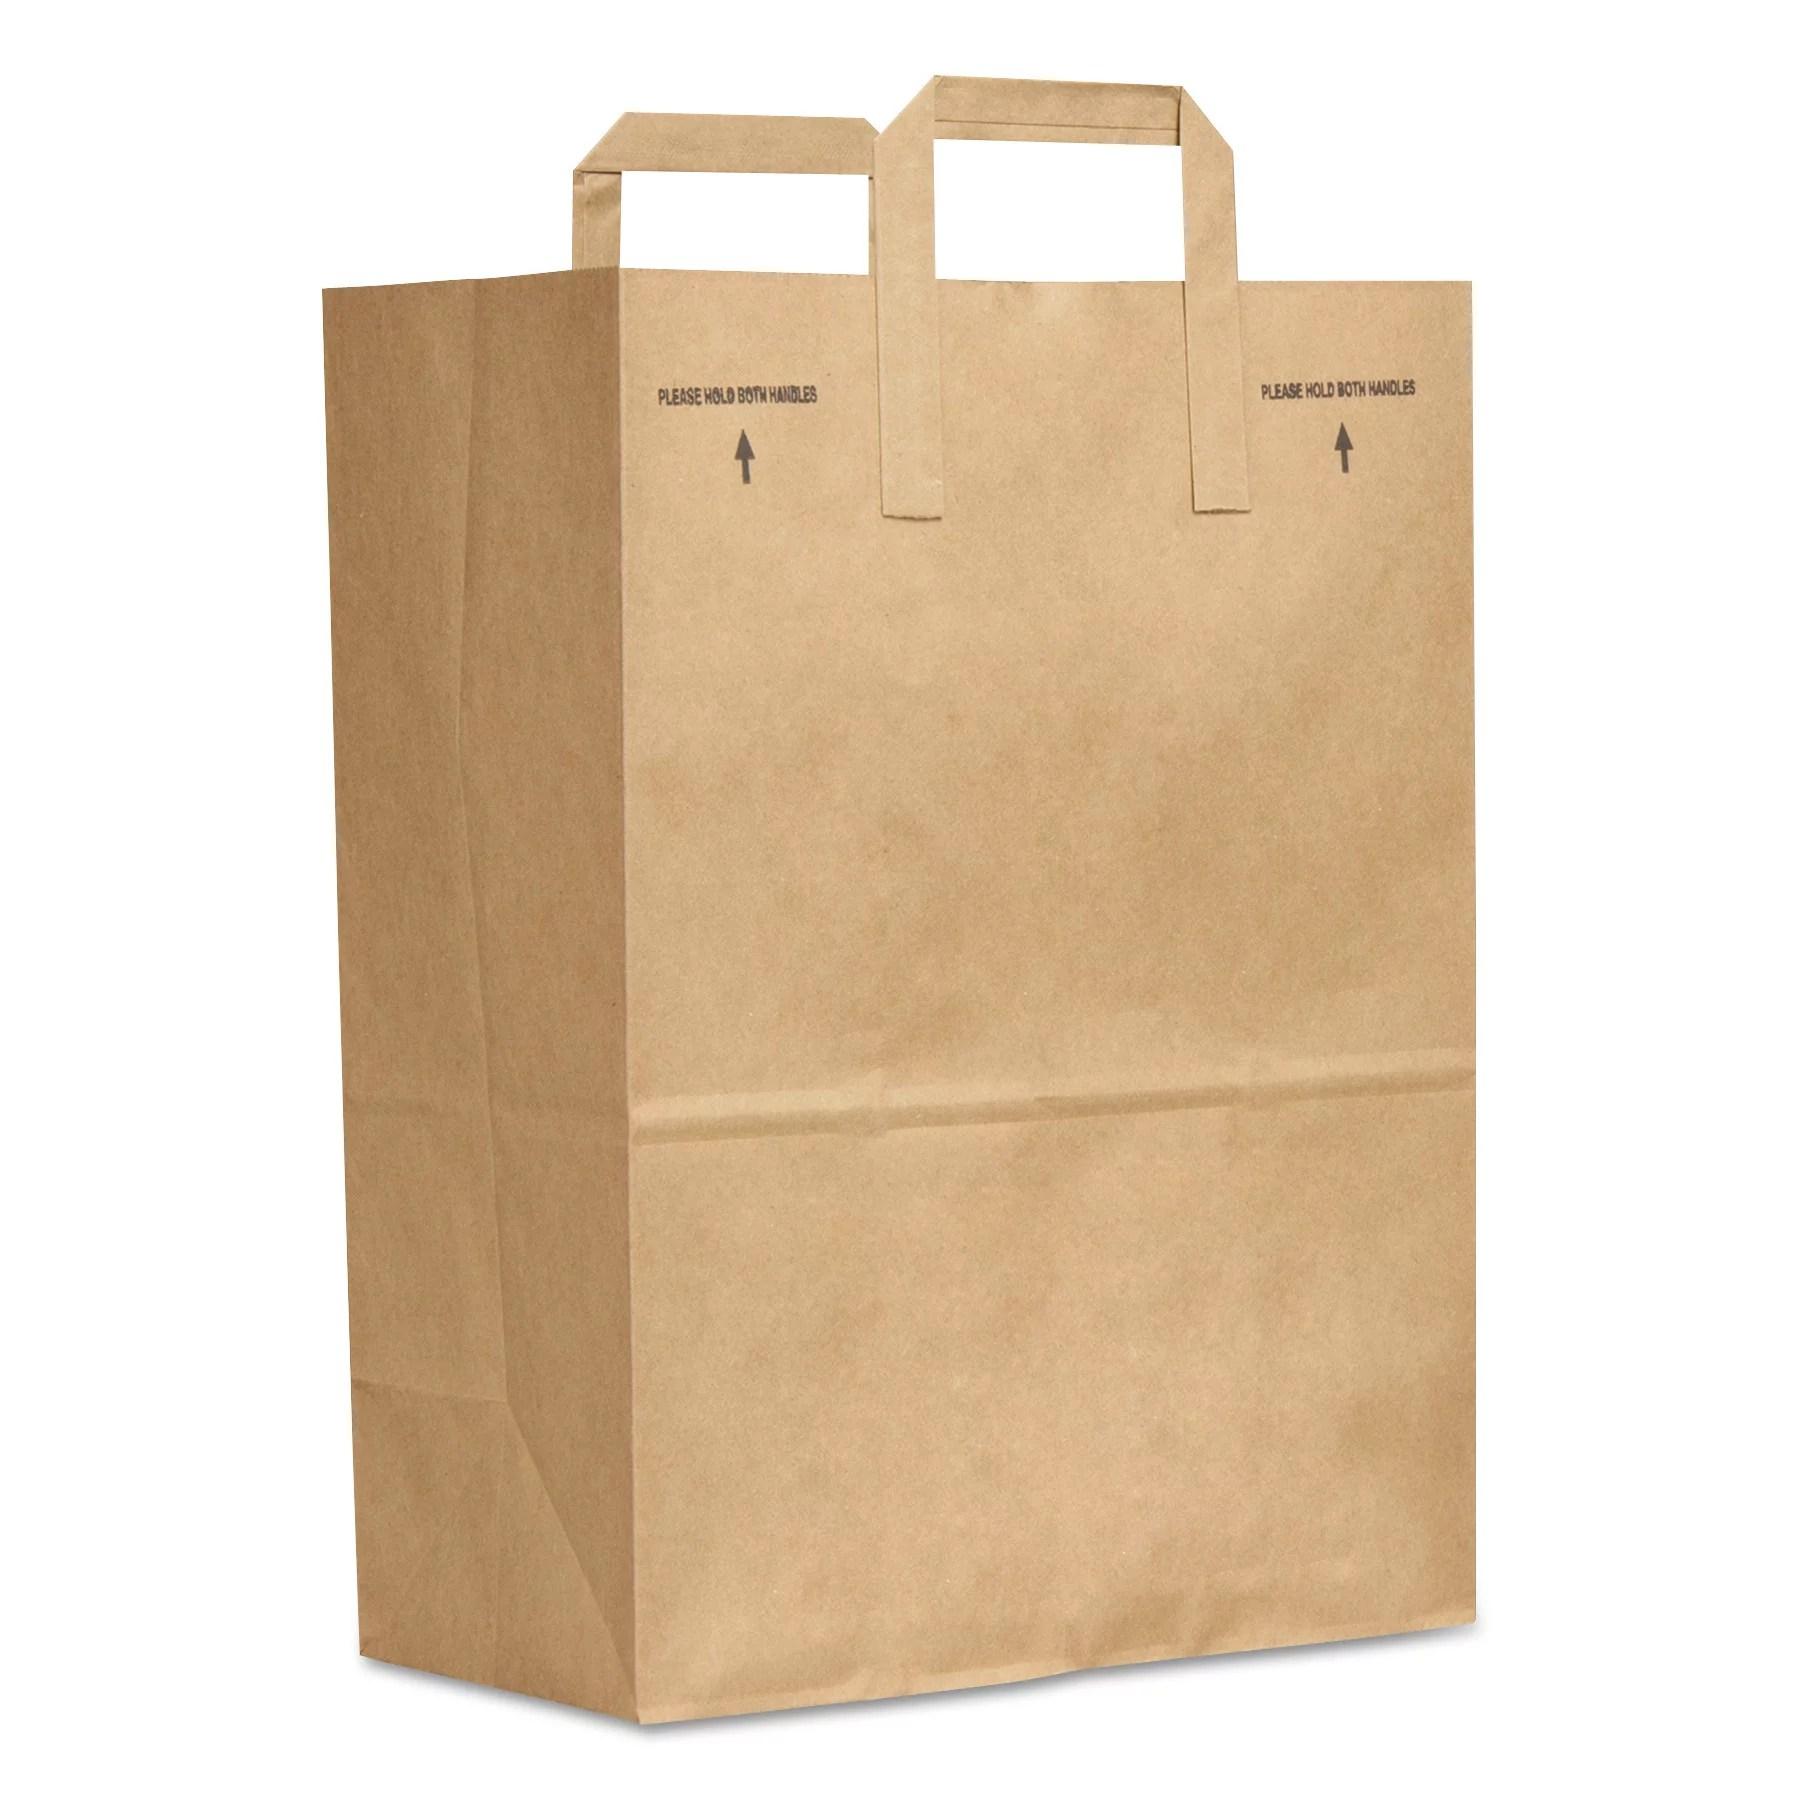 General 1 6 Bbl Paper Grocery Bag 70lb Kraft Standard 12